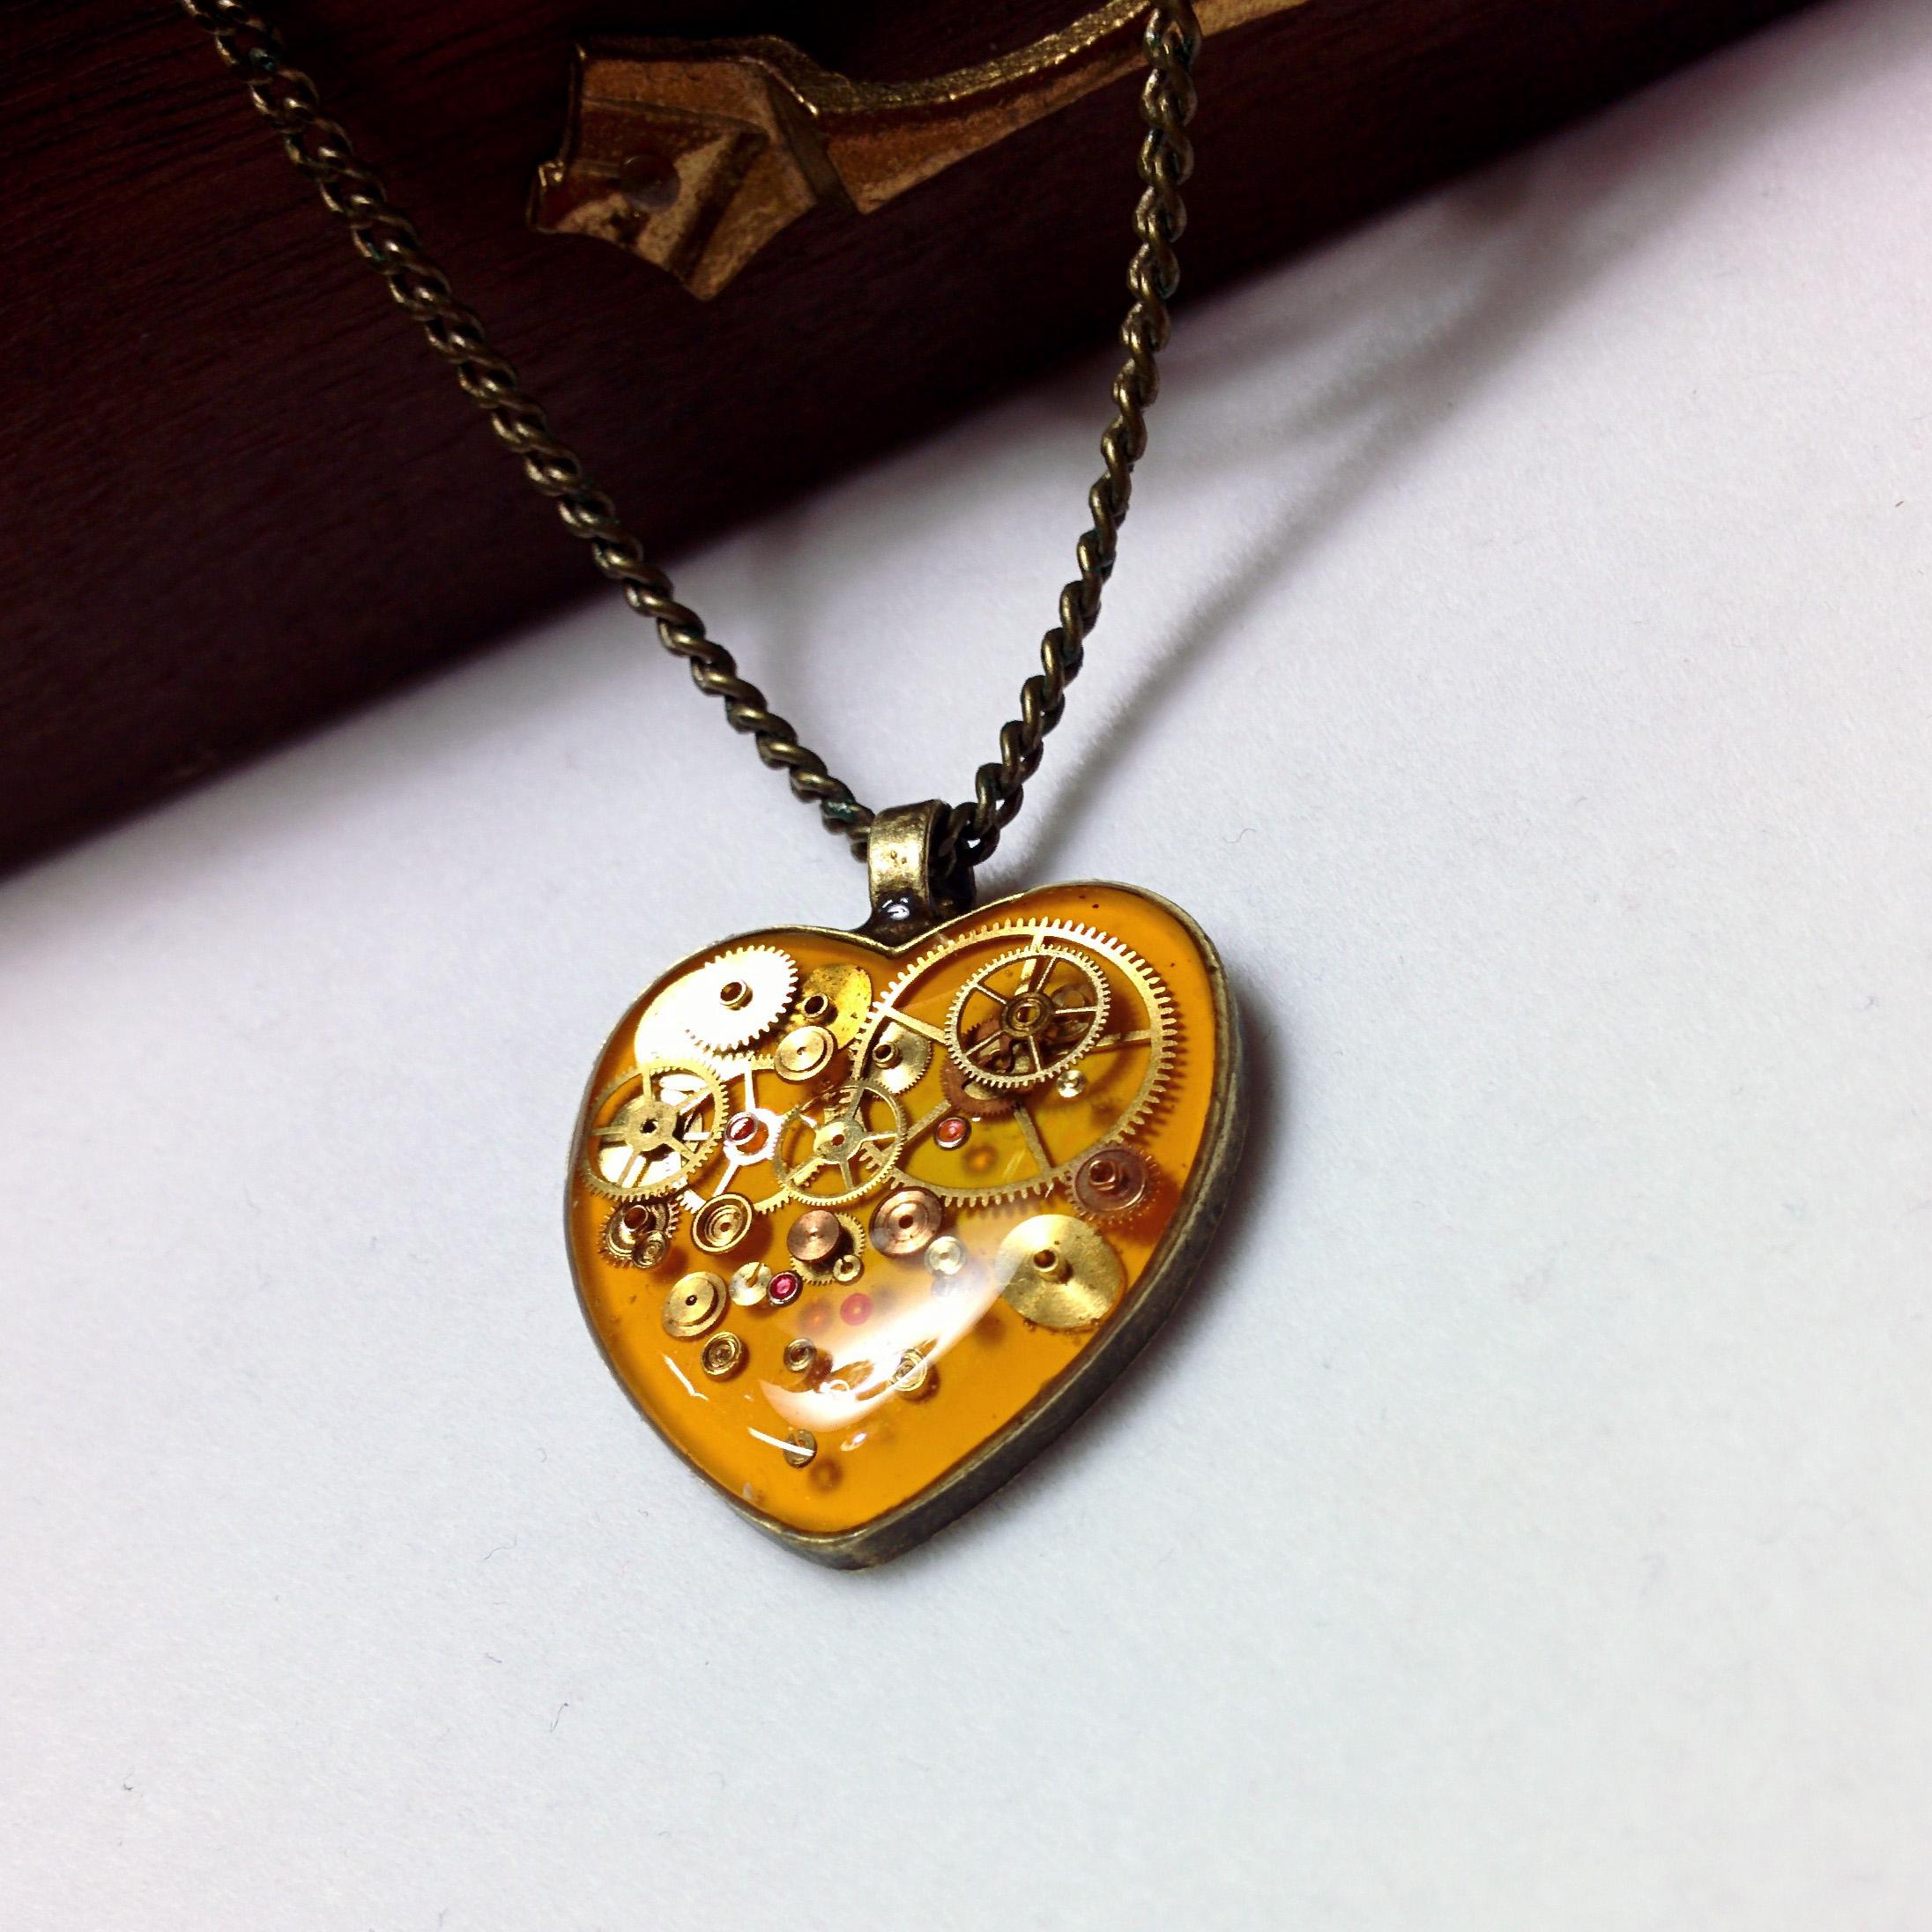 Aminda-Wood-Yellow-Mechanical-Heart.jpg